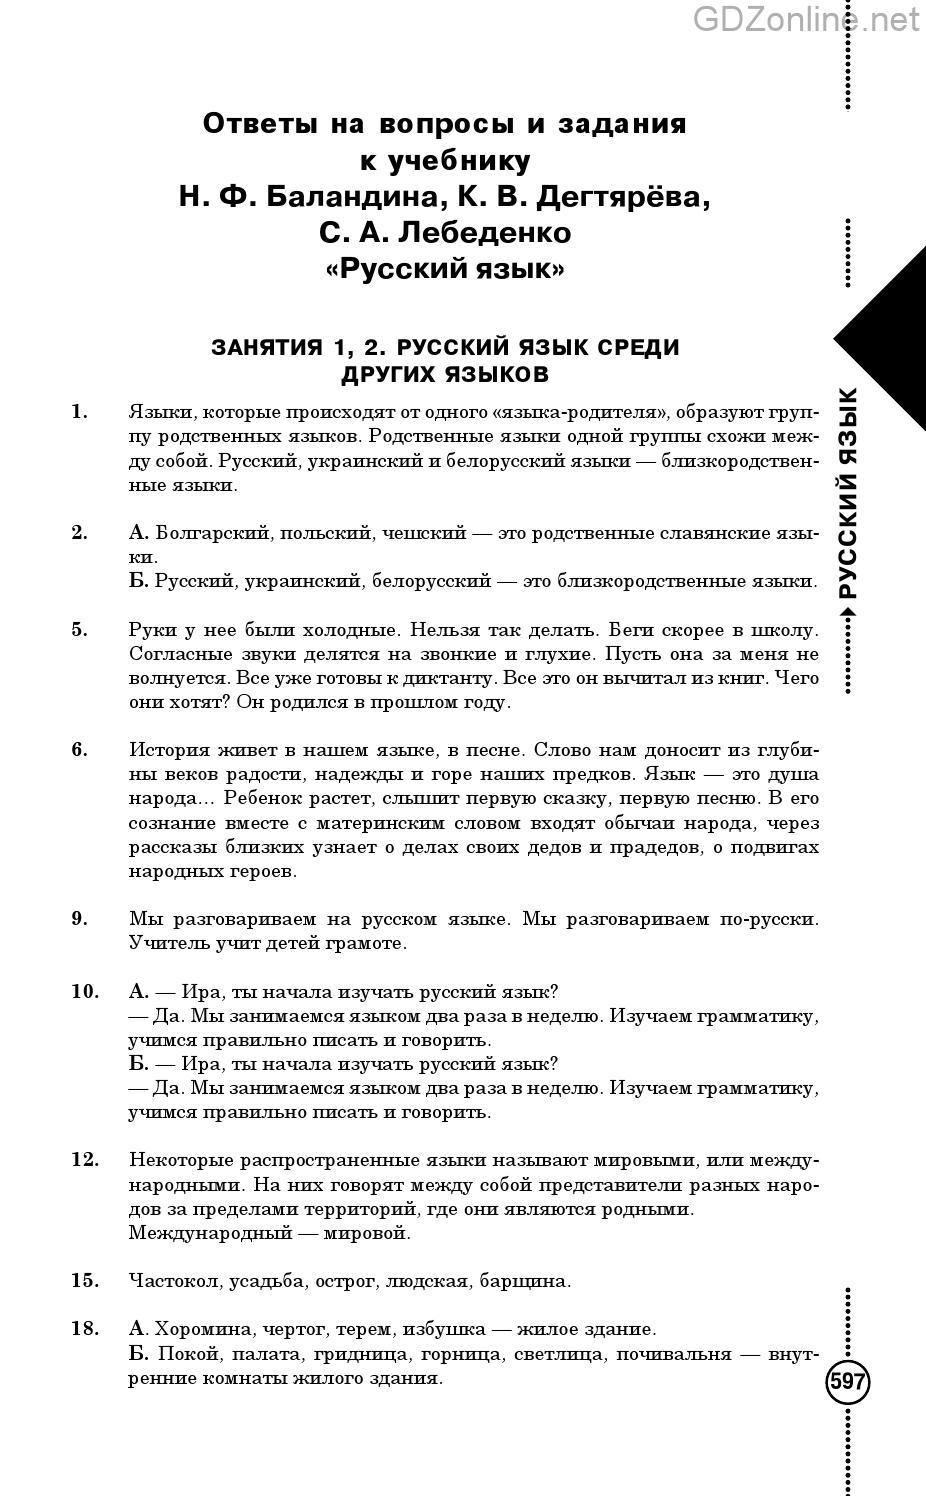 Гдз 6 класс русский баландина дегтярёва лебеденко